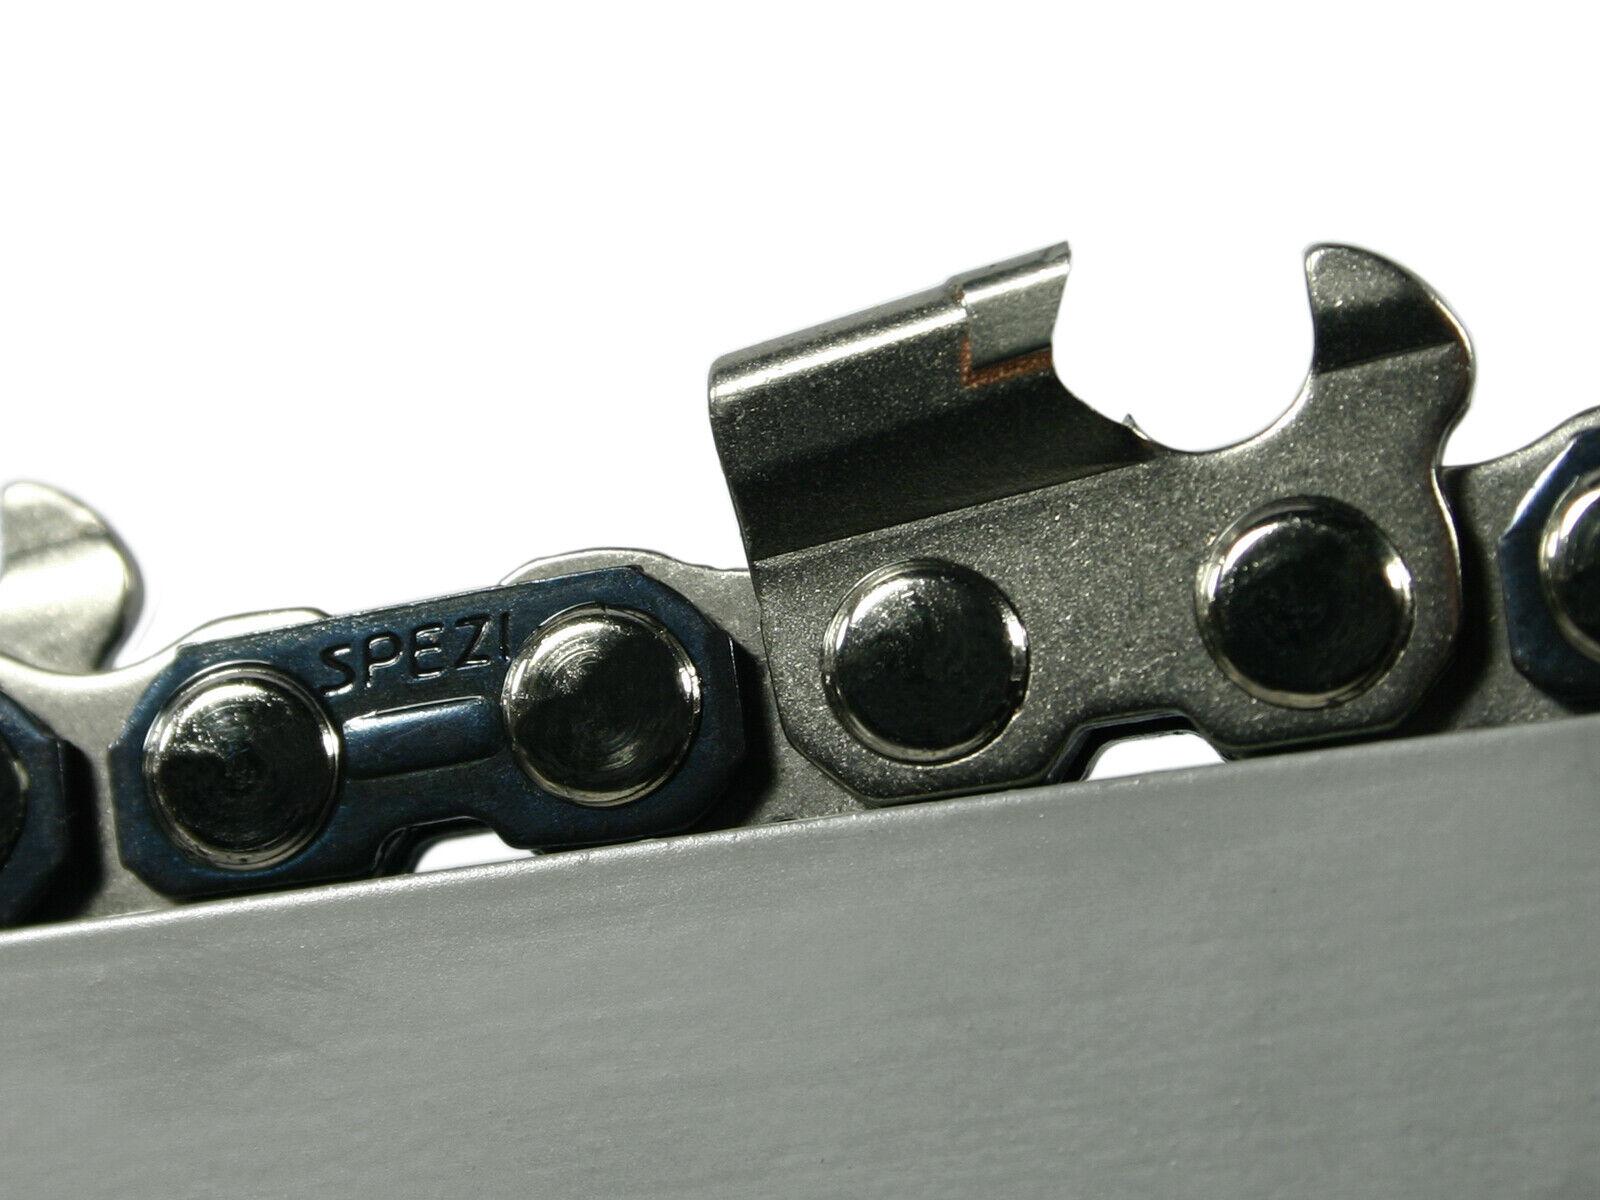 Metal duro cadena sierra adecuado para dolmar ps7300 60 cm 3 8  84 TG 1,5 mm Cochebide